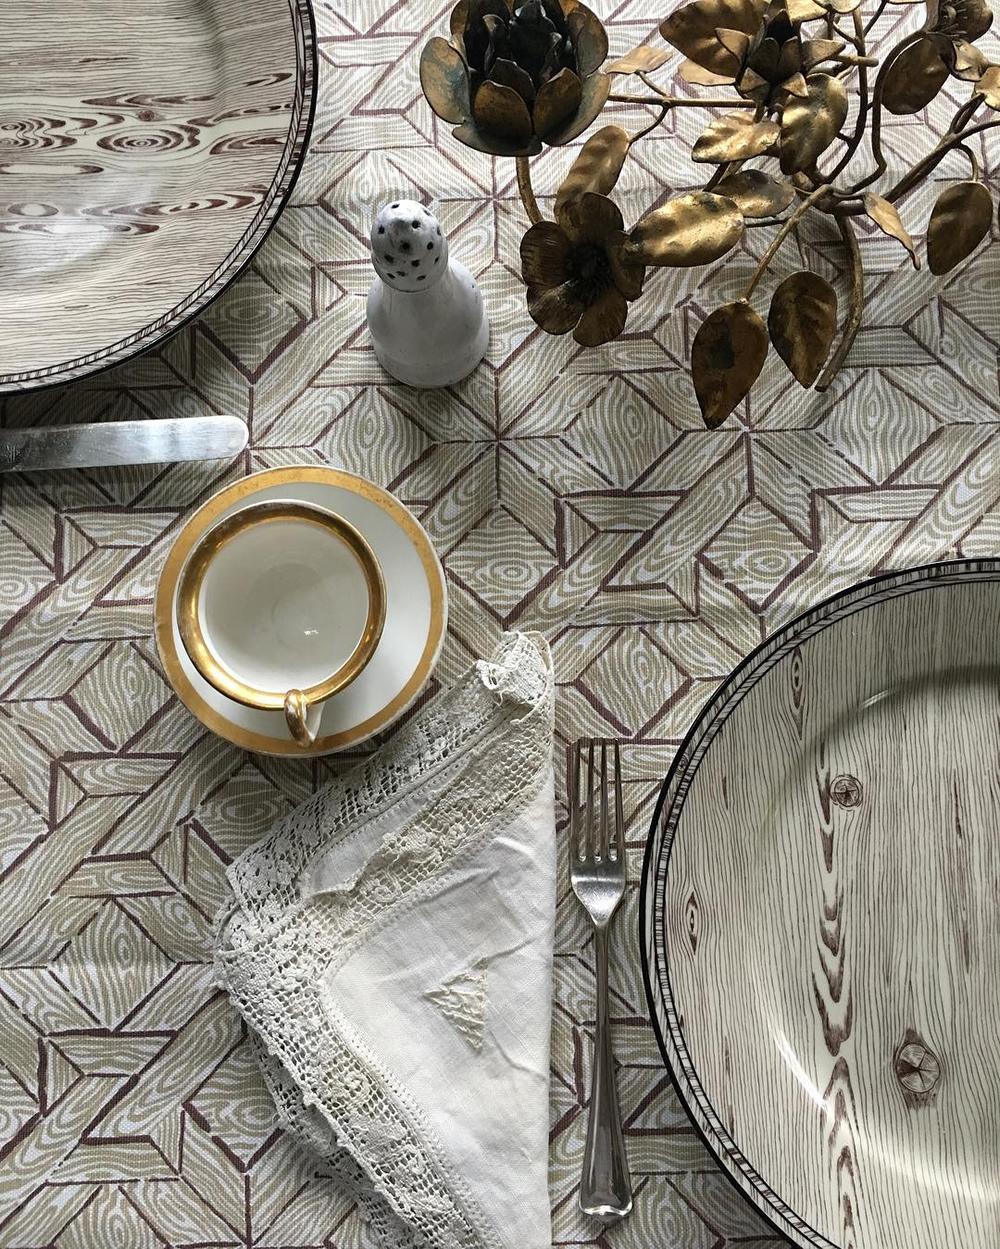 Mieke Ten Have: China Seas Parquetry Table Cloth By Mieke Ten Have